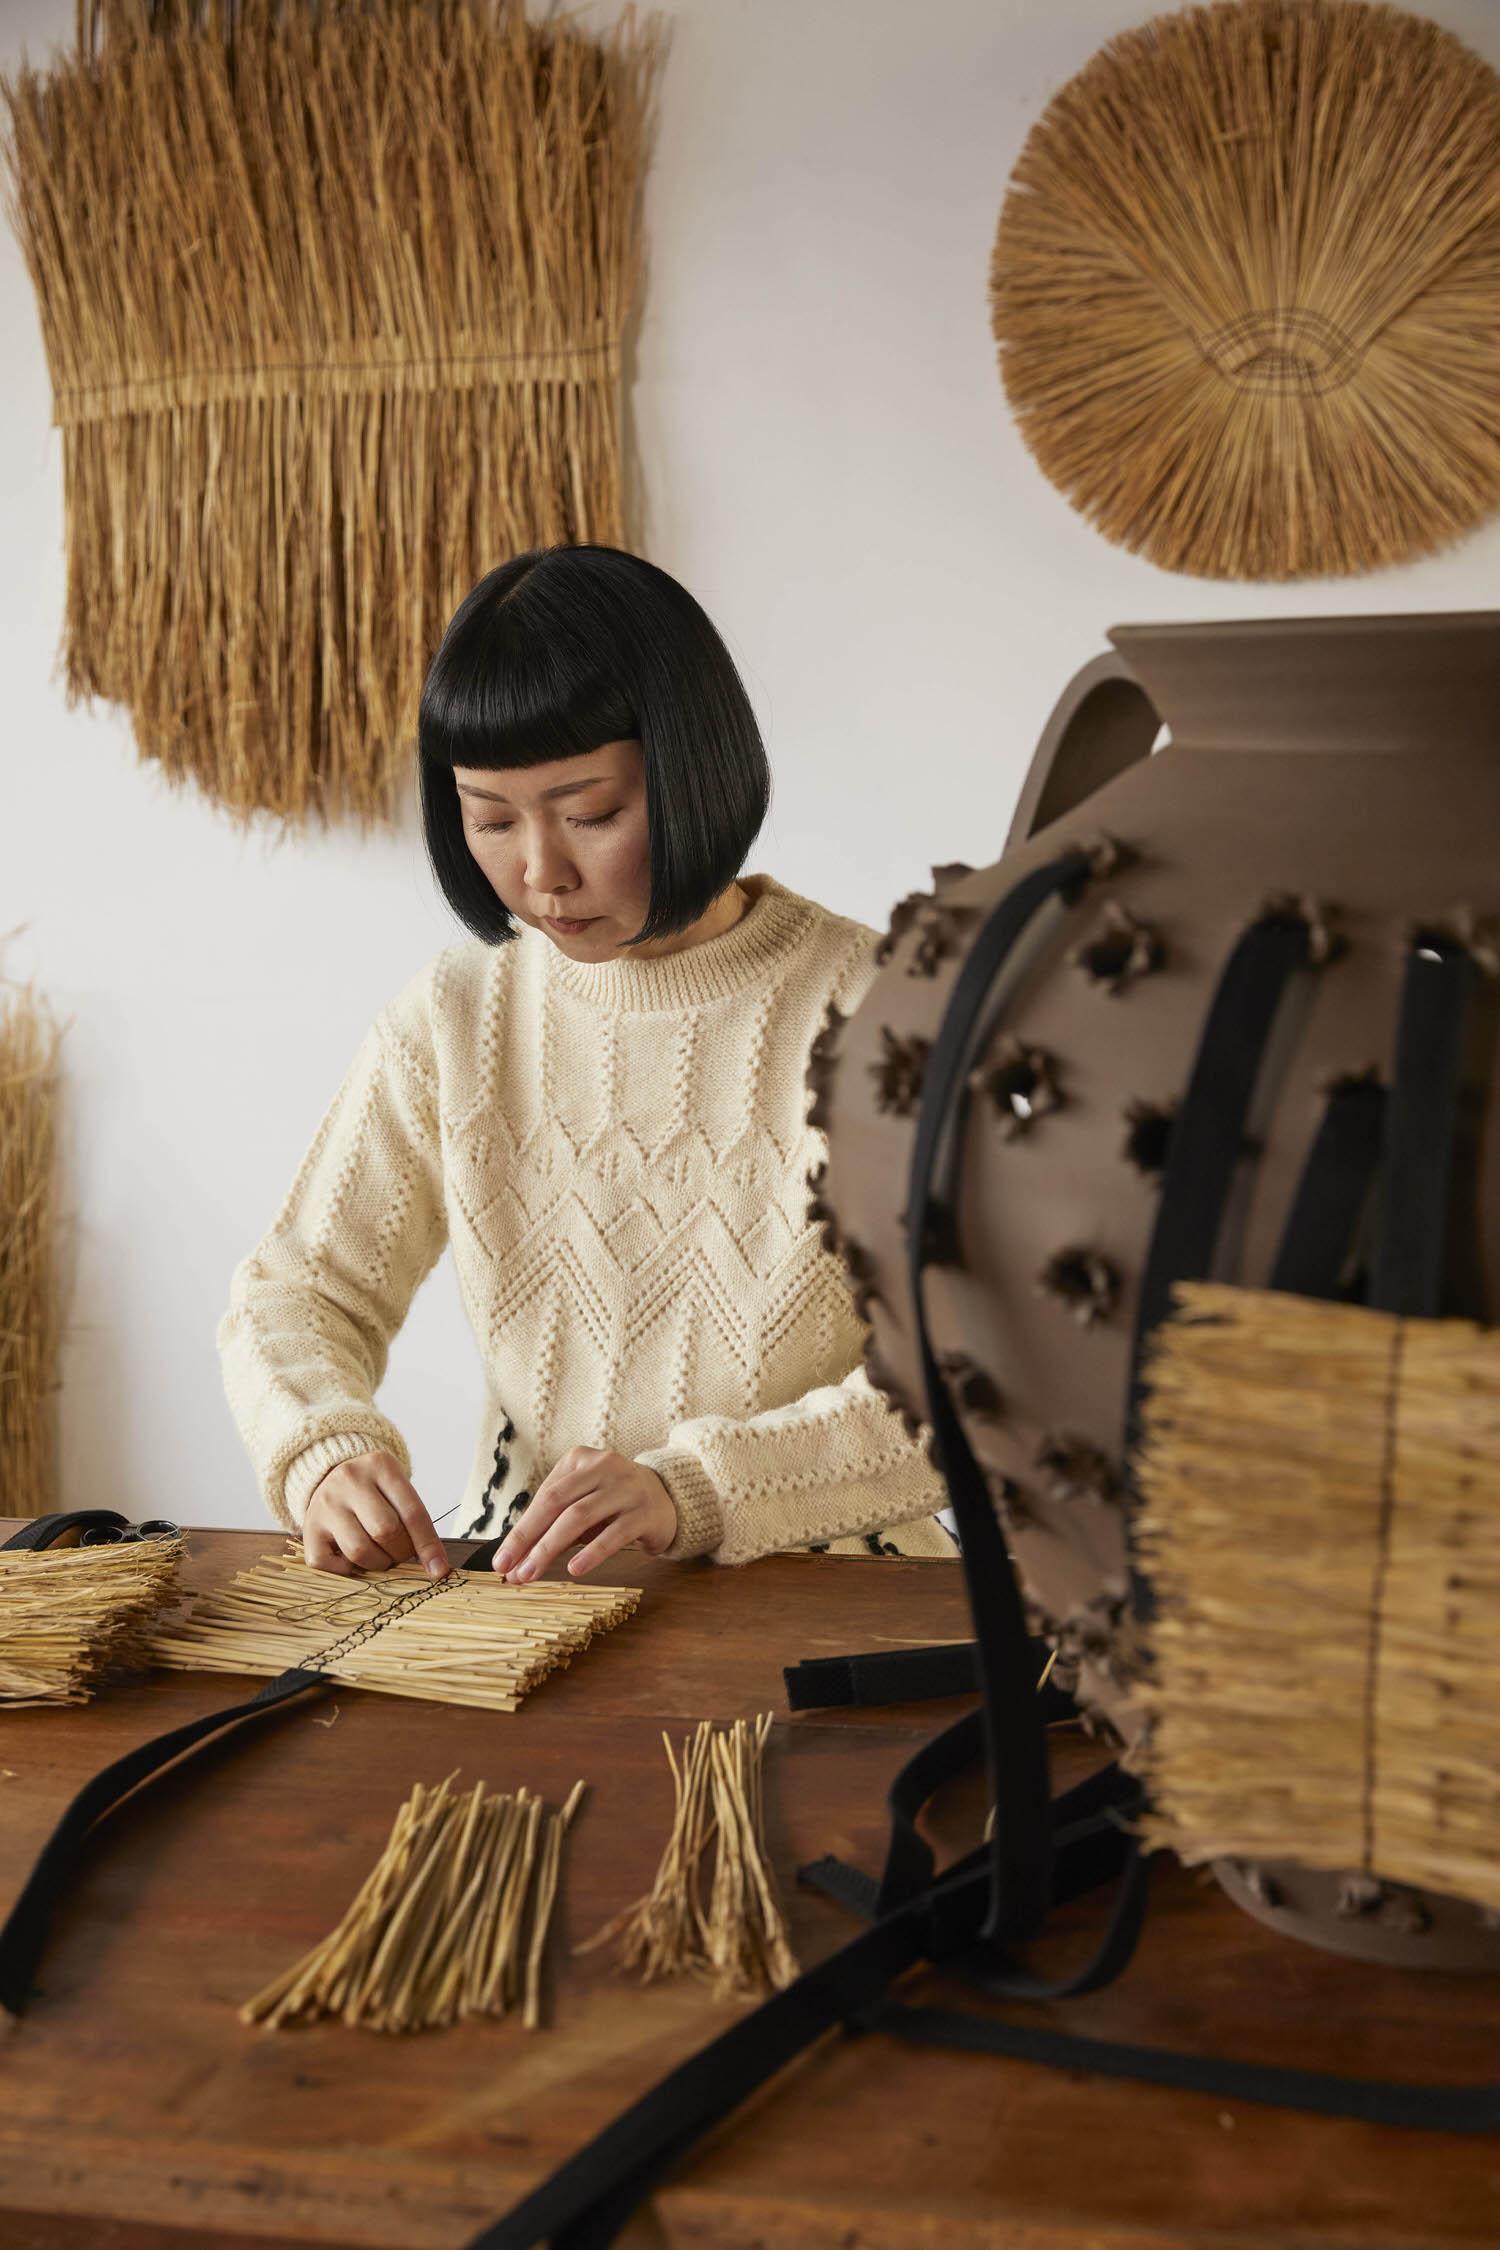 Loewe Waves Grass Weaving Artist Arko Yellowtrace 05